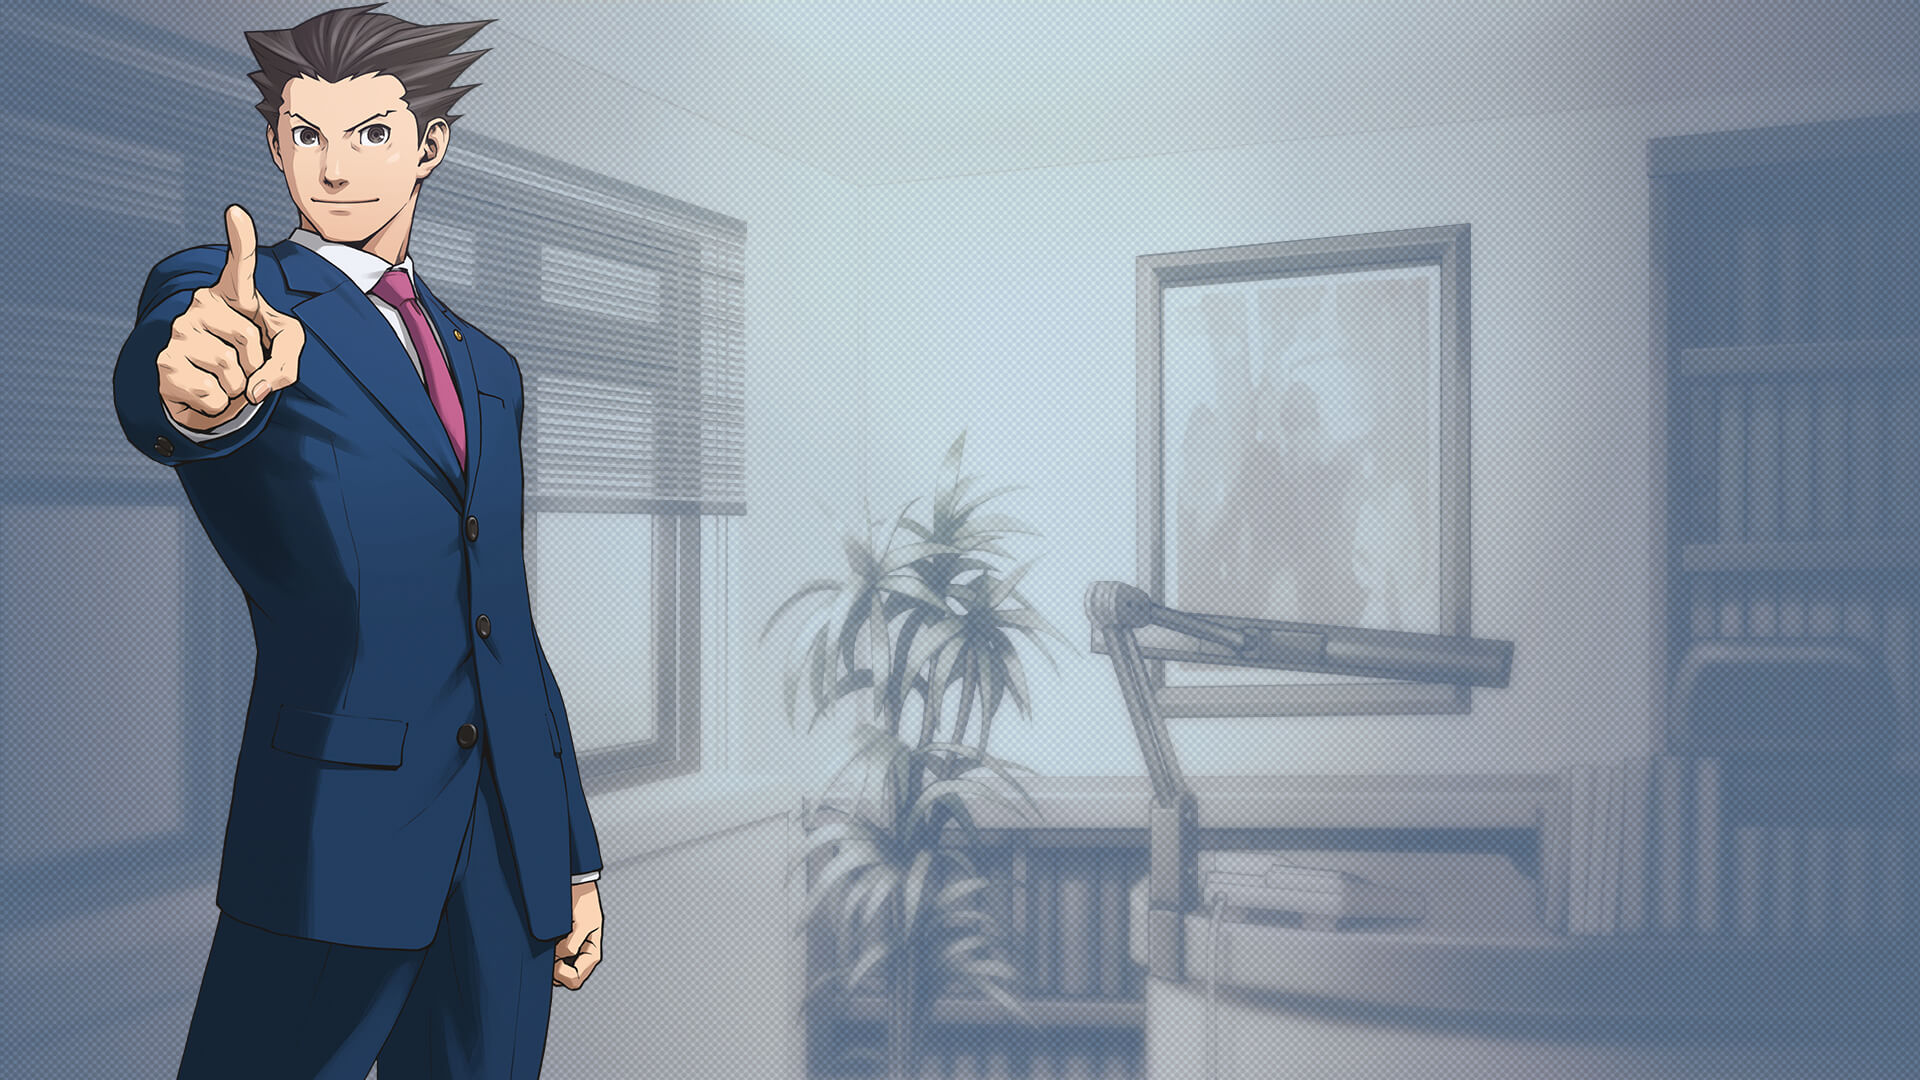 Showcase Phoenix Wright Ace Attorney Trilogy